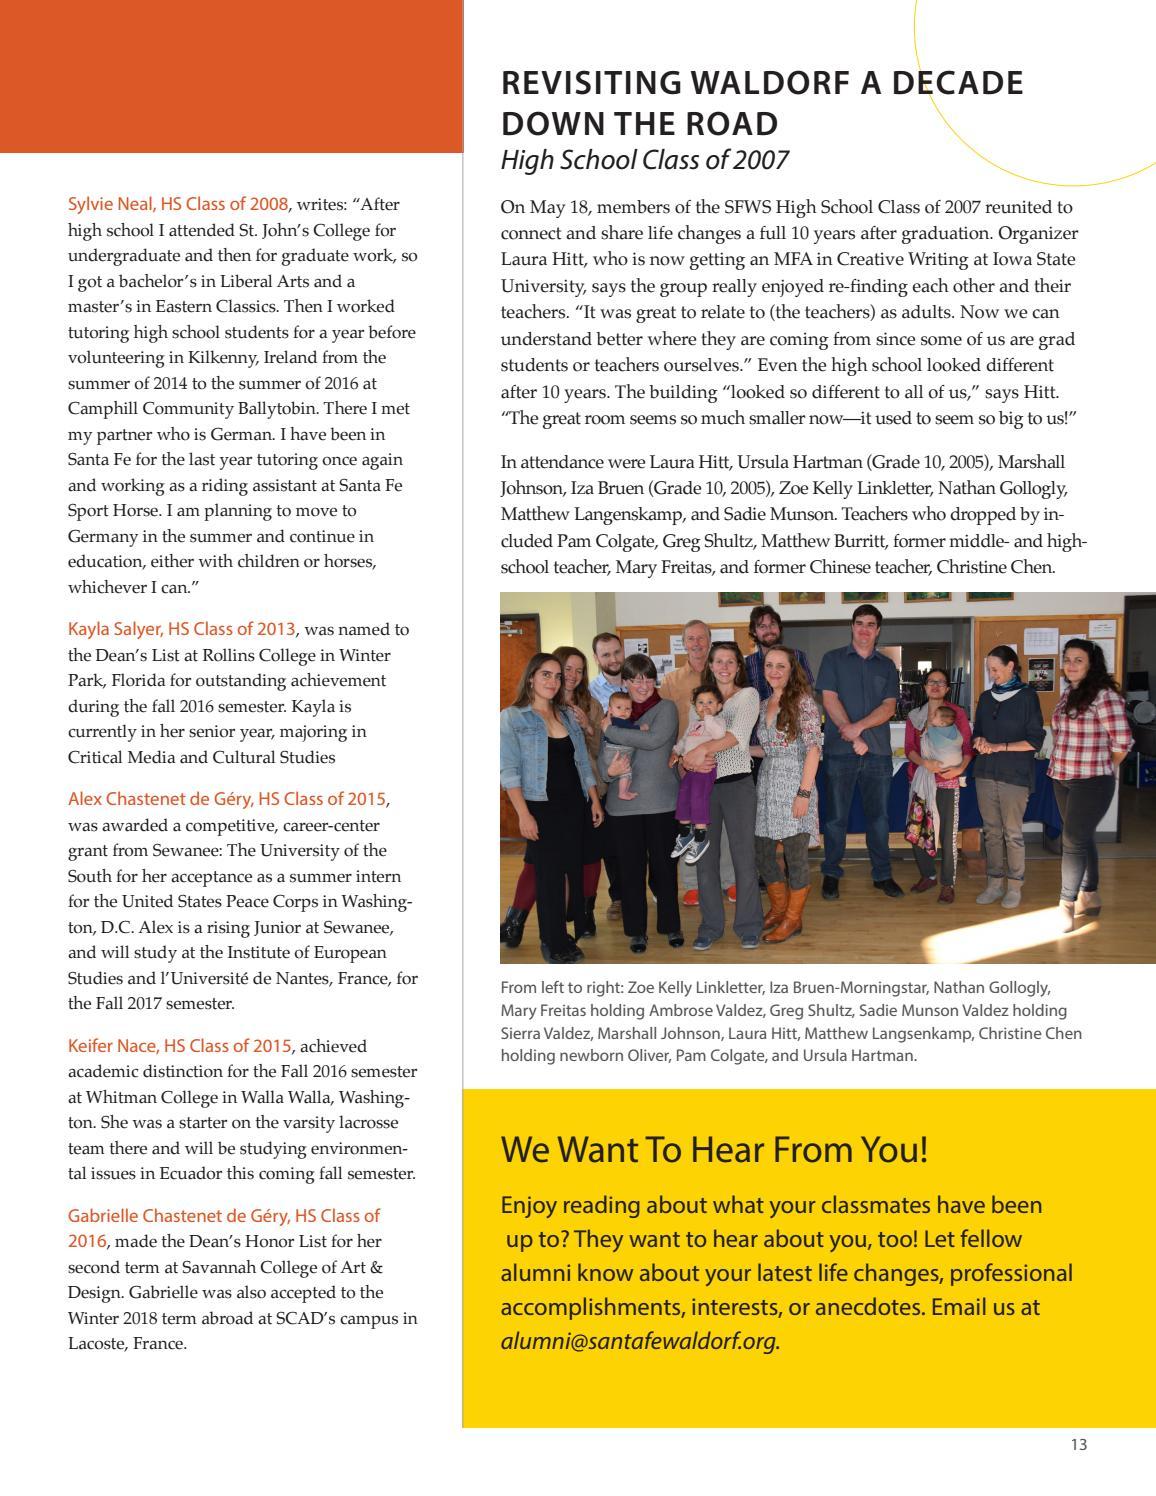 Santa Fe Waldorf School Alumni Magazine Summer 2017 by Santa